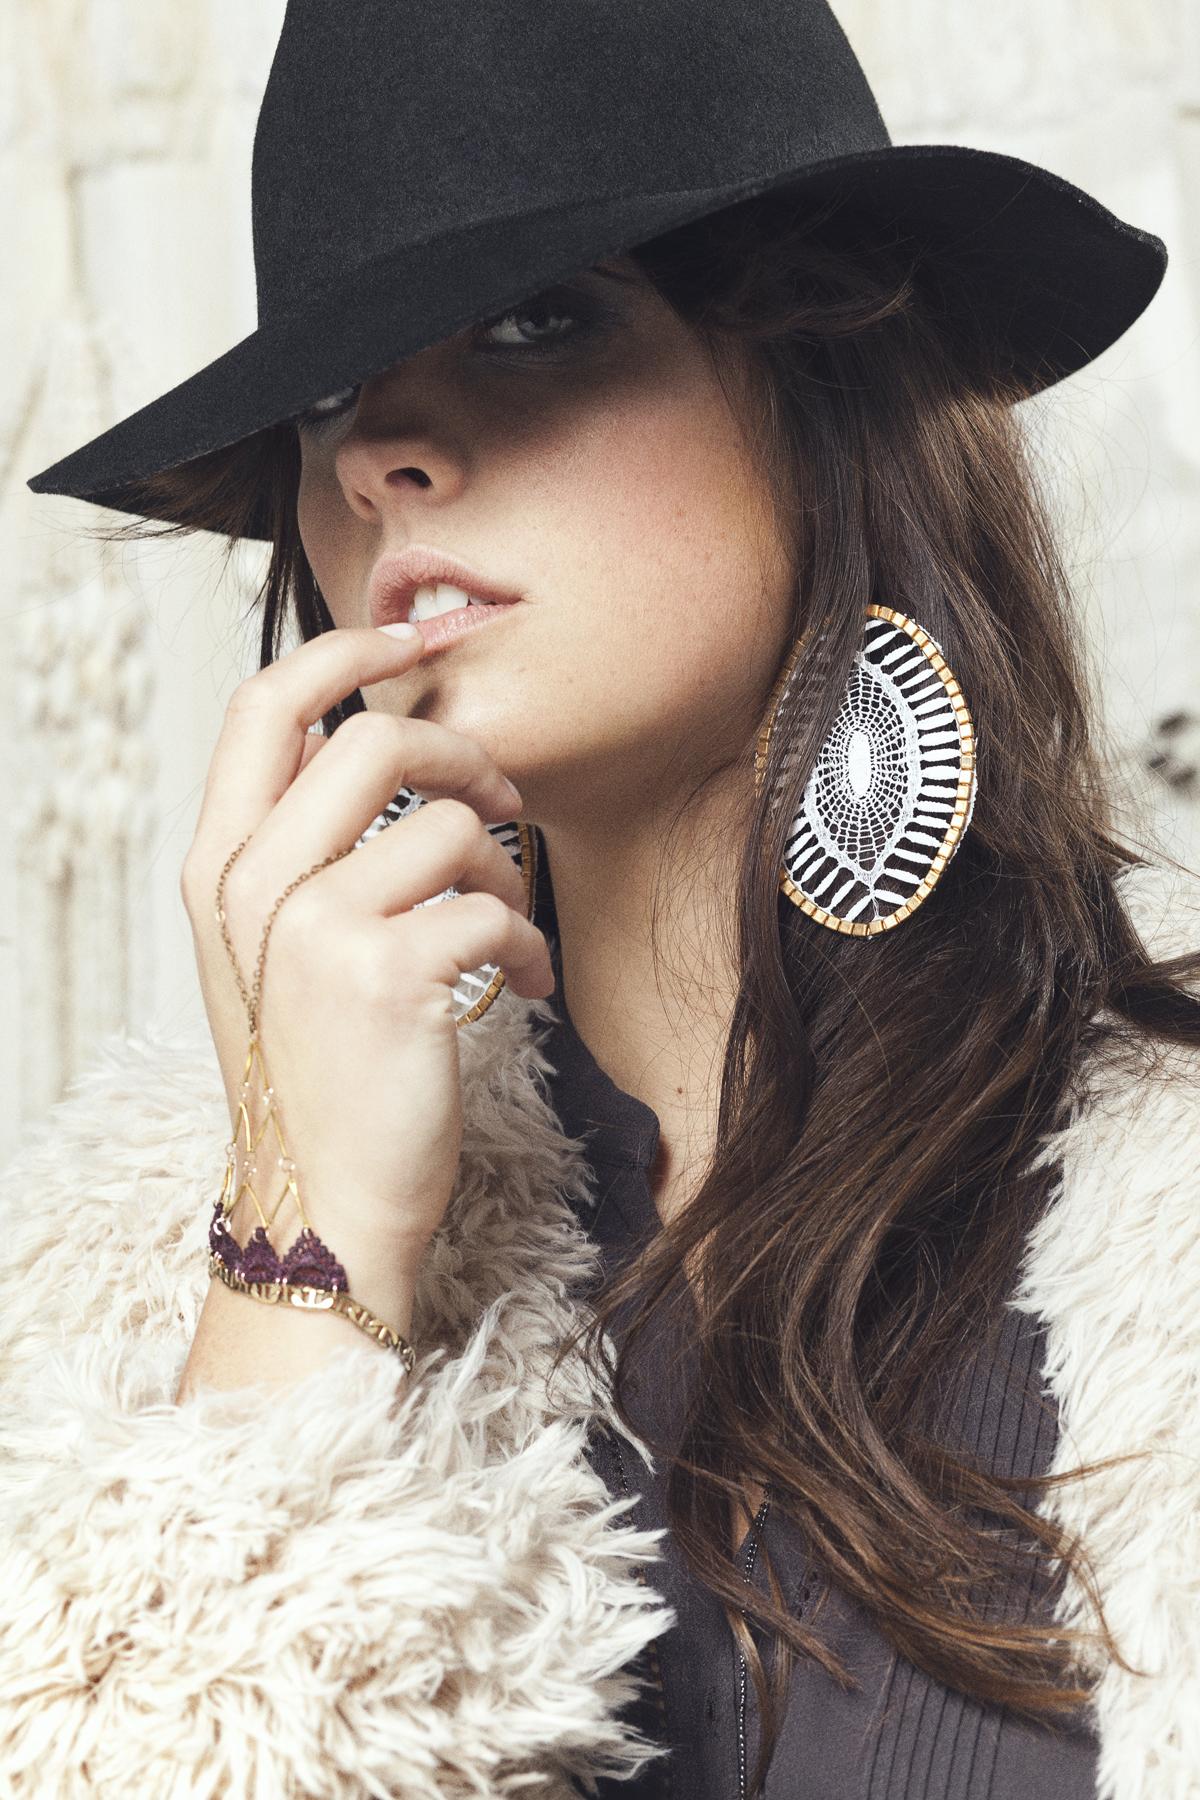 Insula earrings (details here) +  Marrakech bracelet (details here)